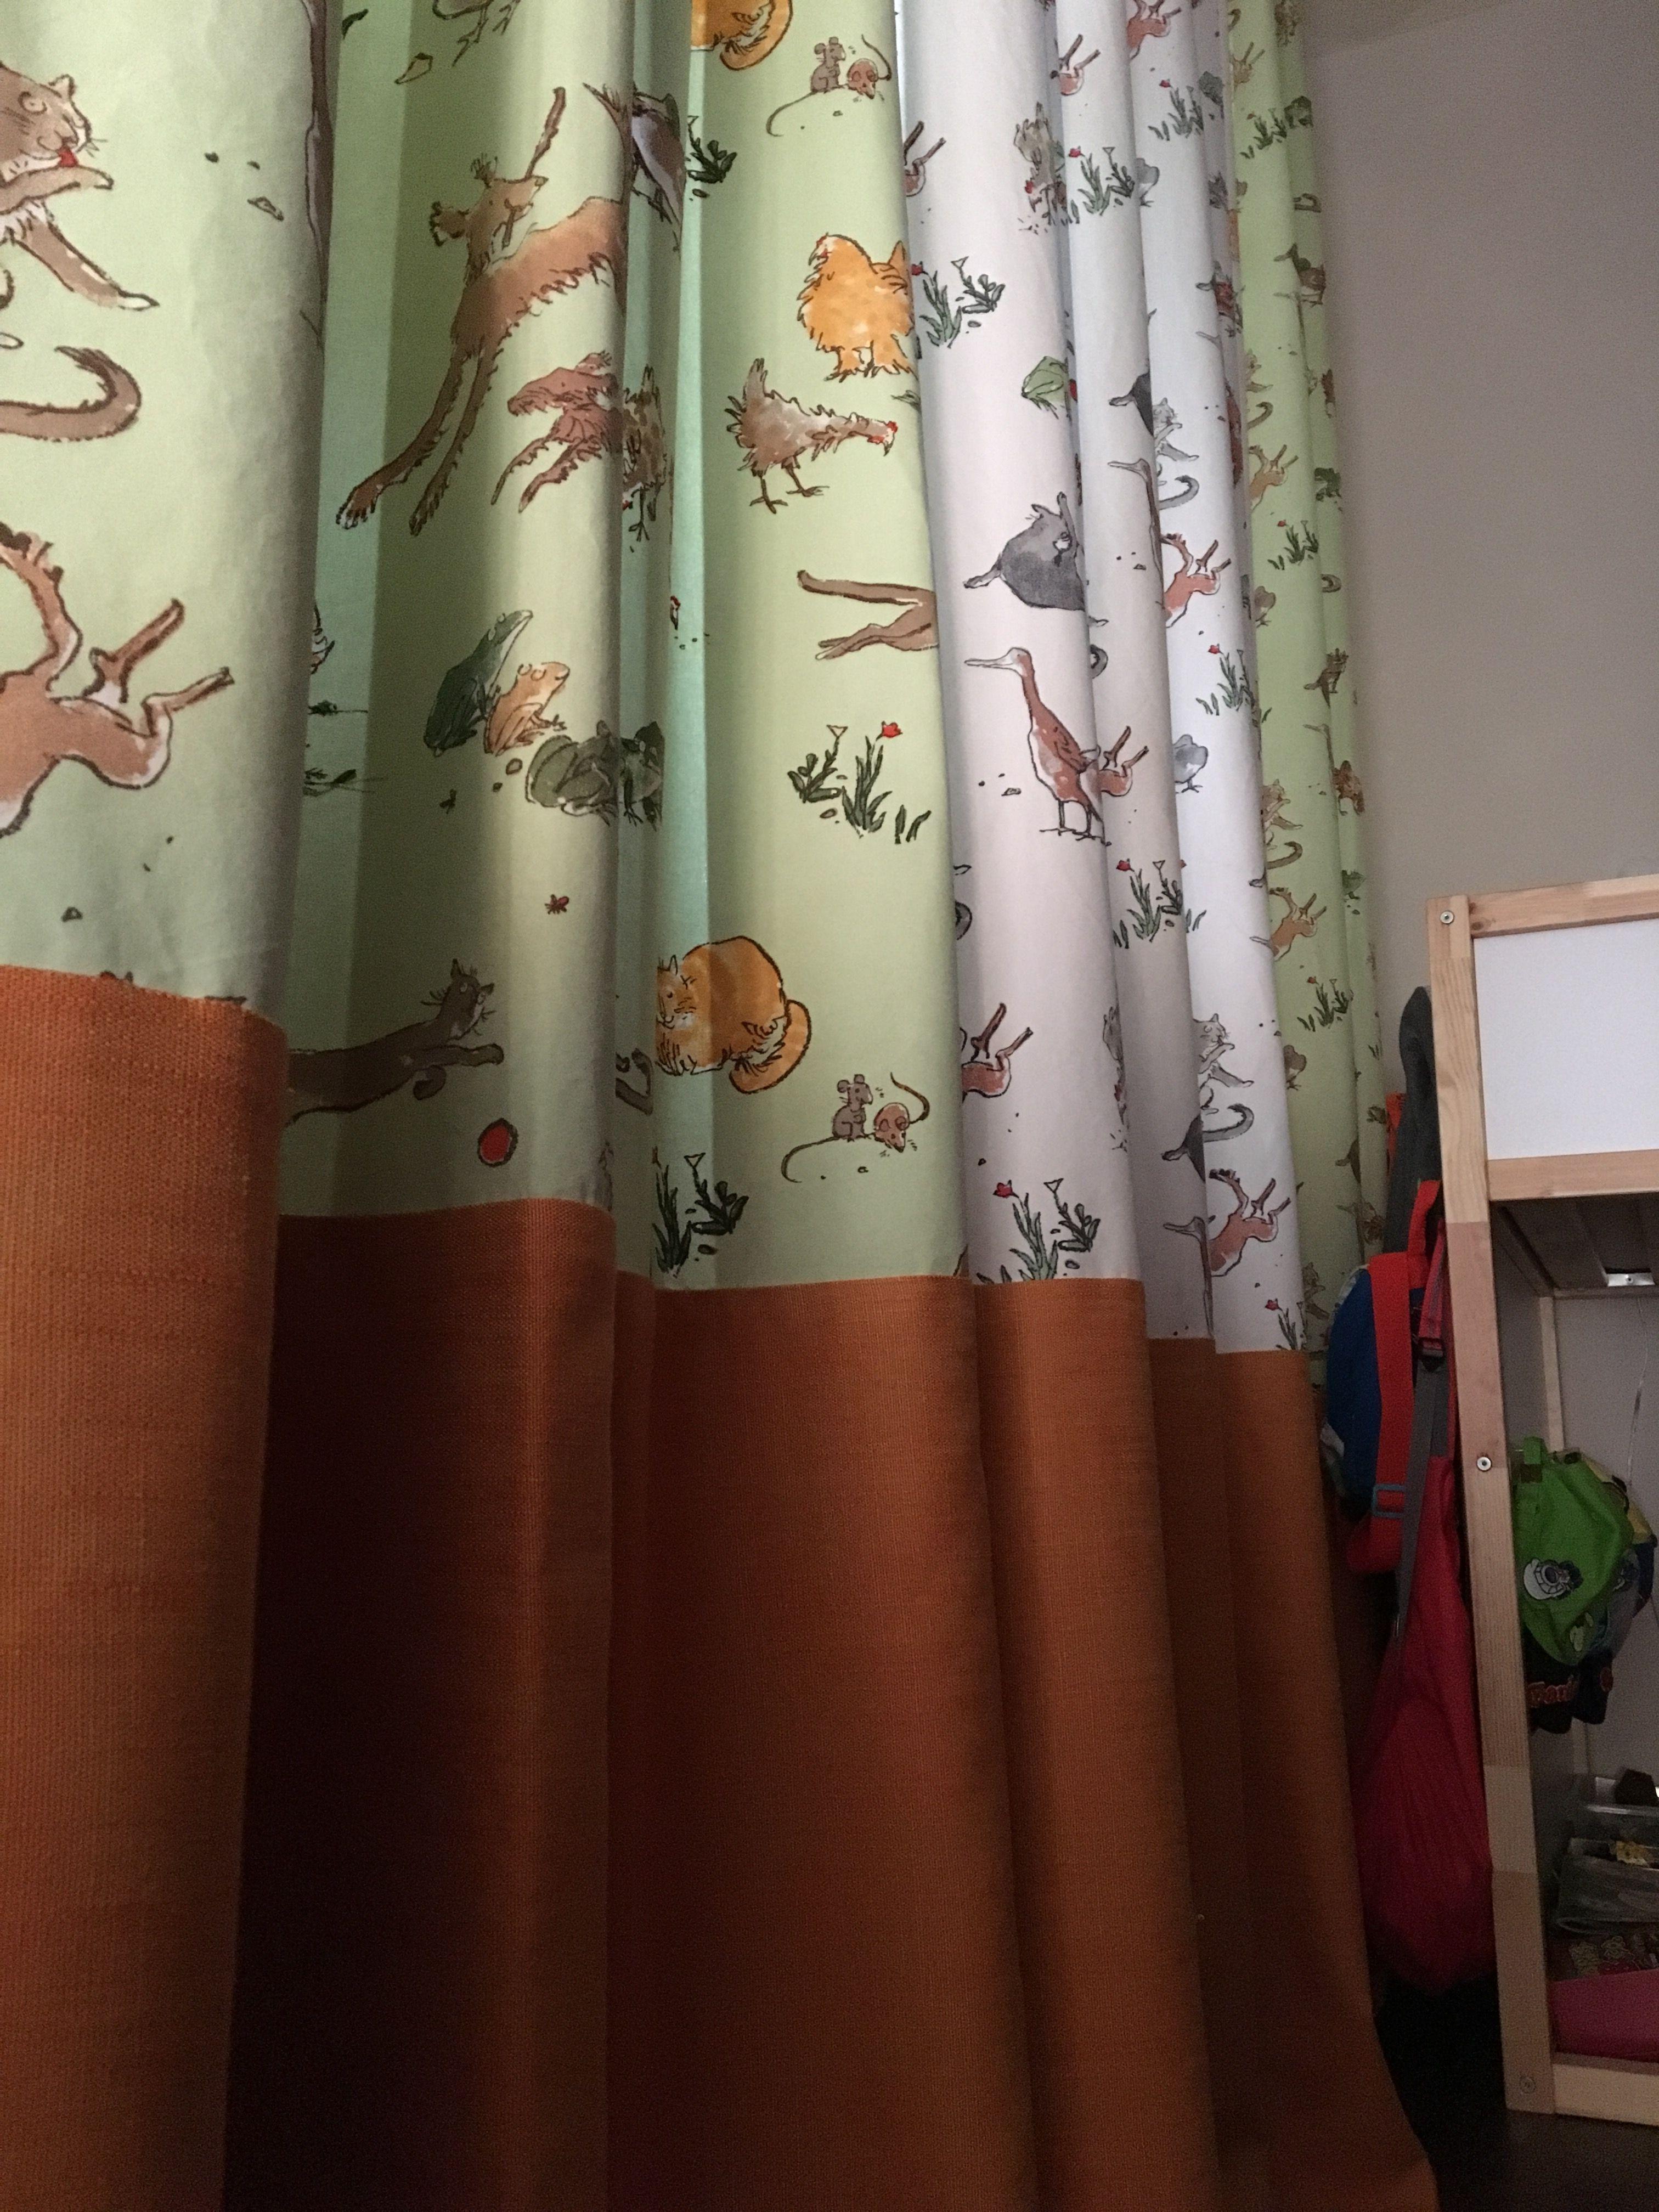 #kids #animal #curtains ....by #NIDOtorino #osborneandlittle  and #scion #fabrics